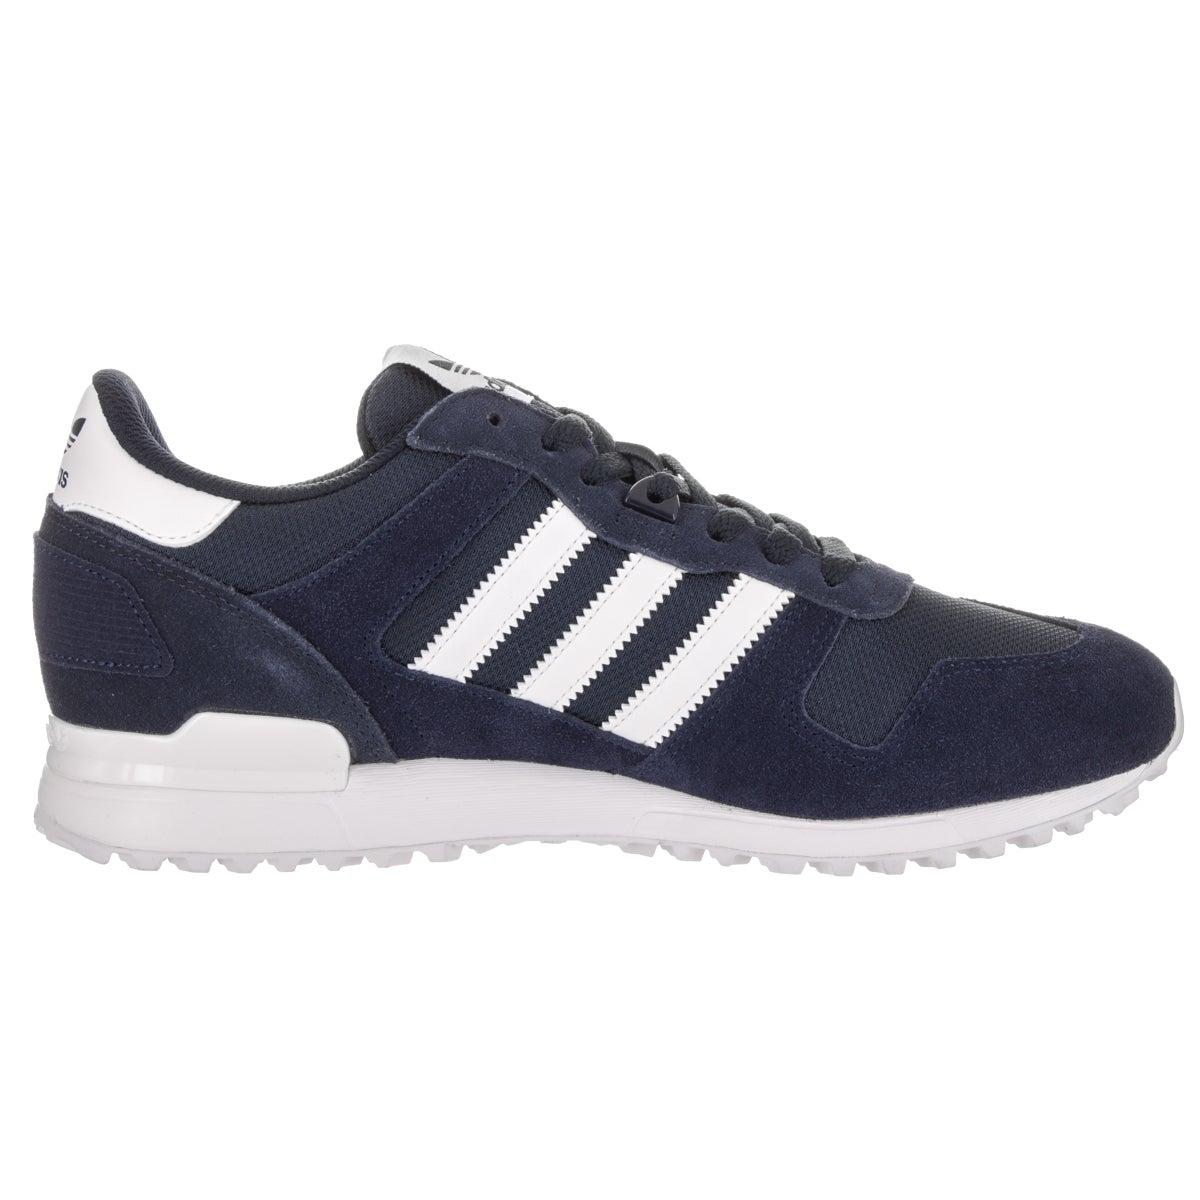 adidas zx 700 grey Off 63%